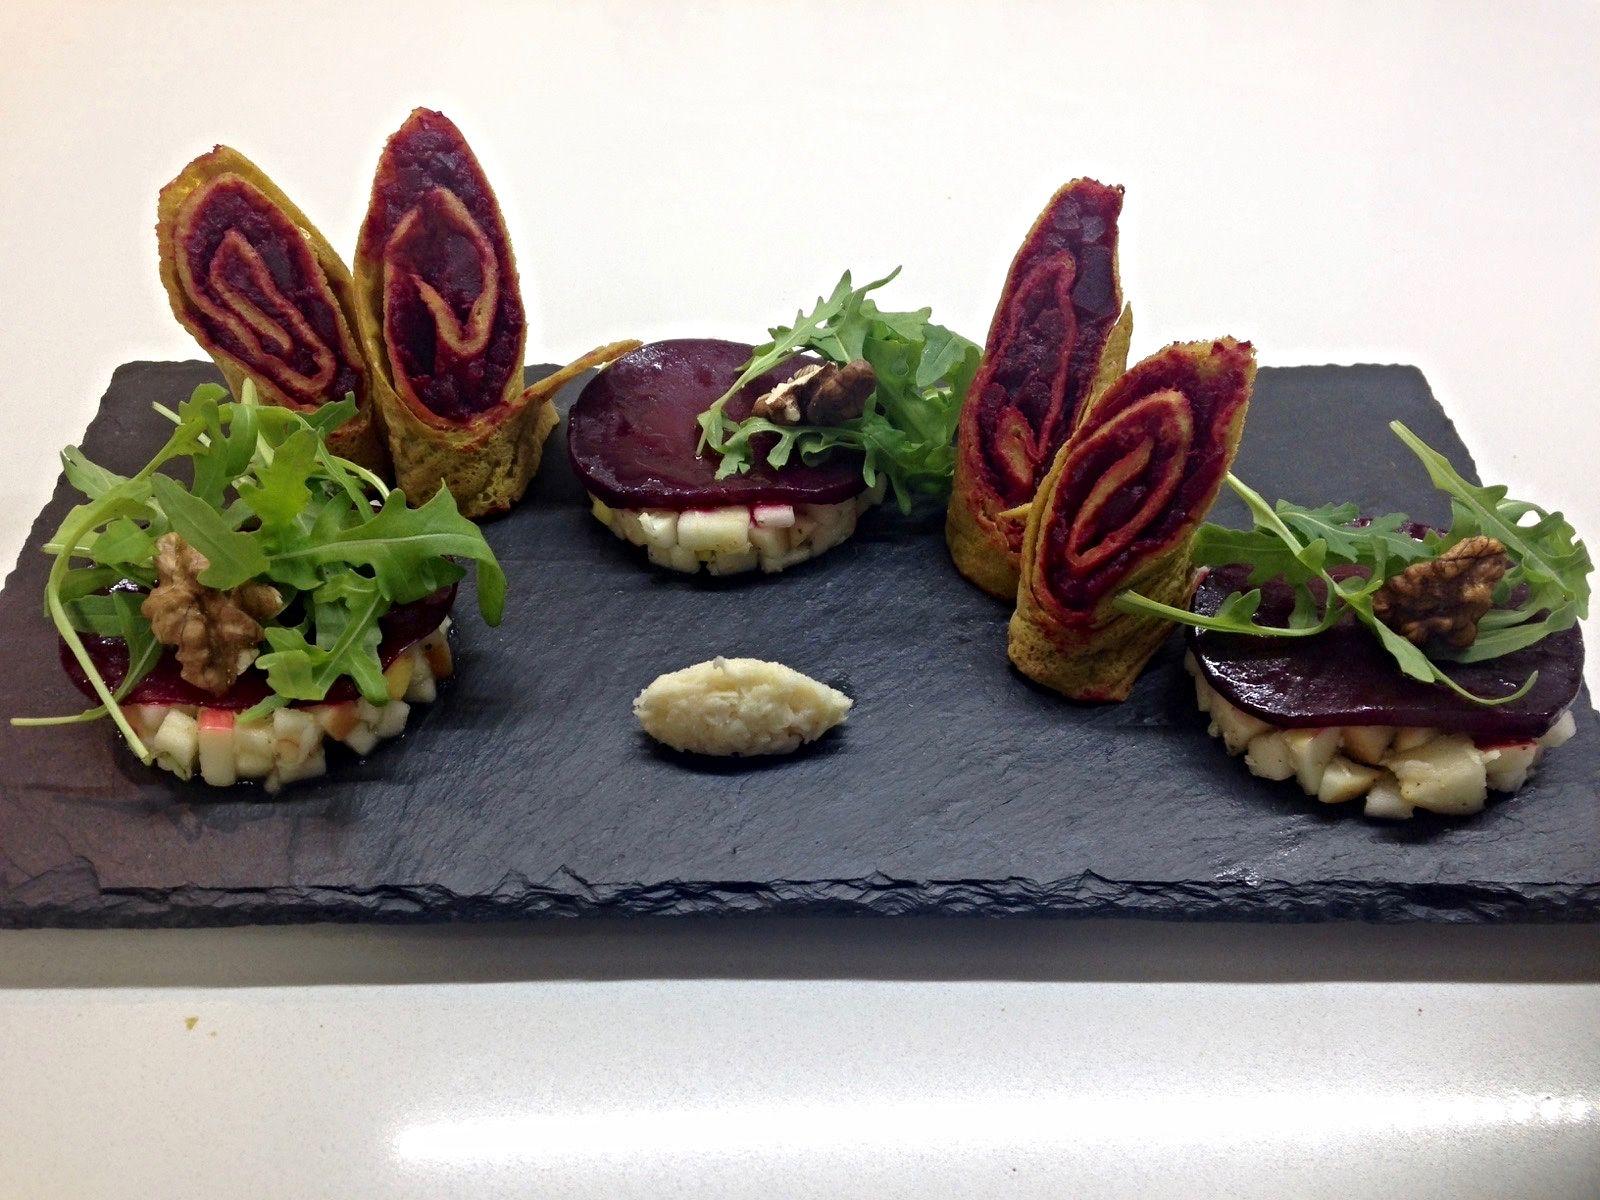 Kurkuma Rote Beete Palatschinken mit Apfel-Meerettichsalat und Carpaccio — DiSaWi Stories